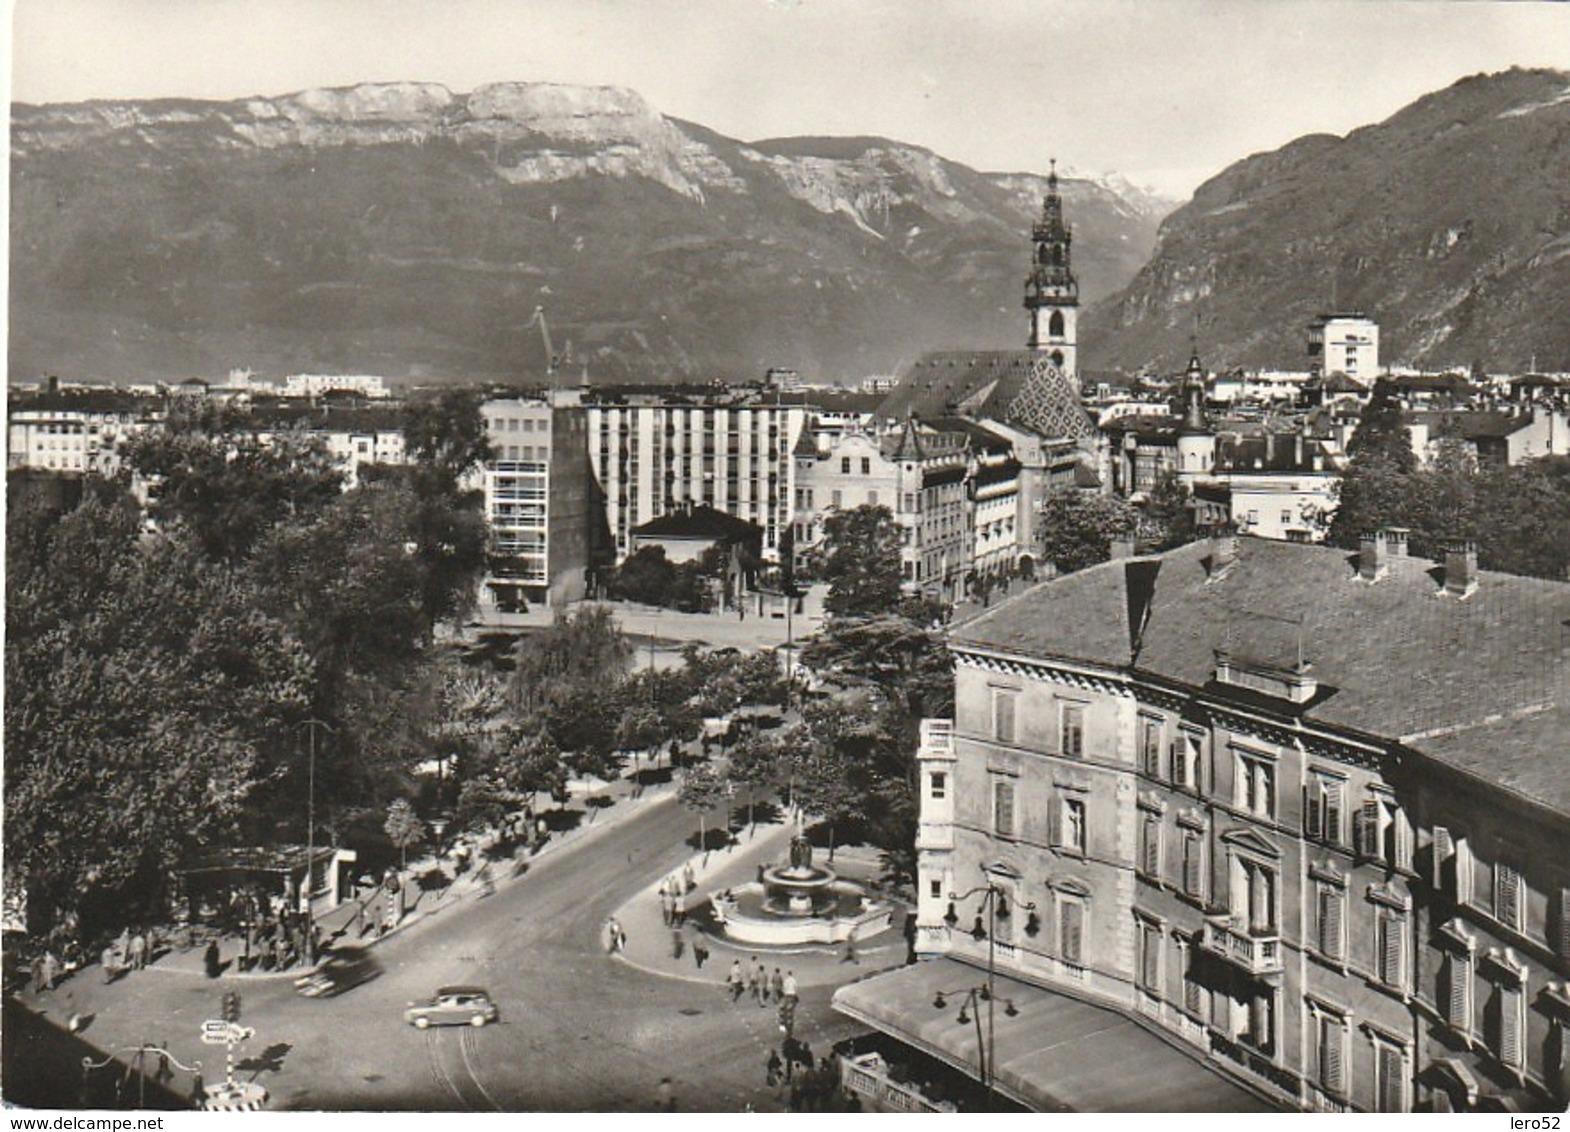 BOLZANO CITTA' ZONA STAZIONE VEDUTA PANORAMICA ANIMATA - Bolzano (Bozen)